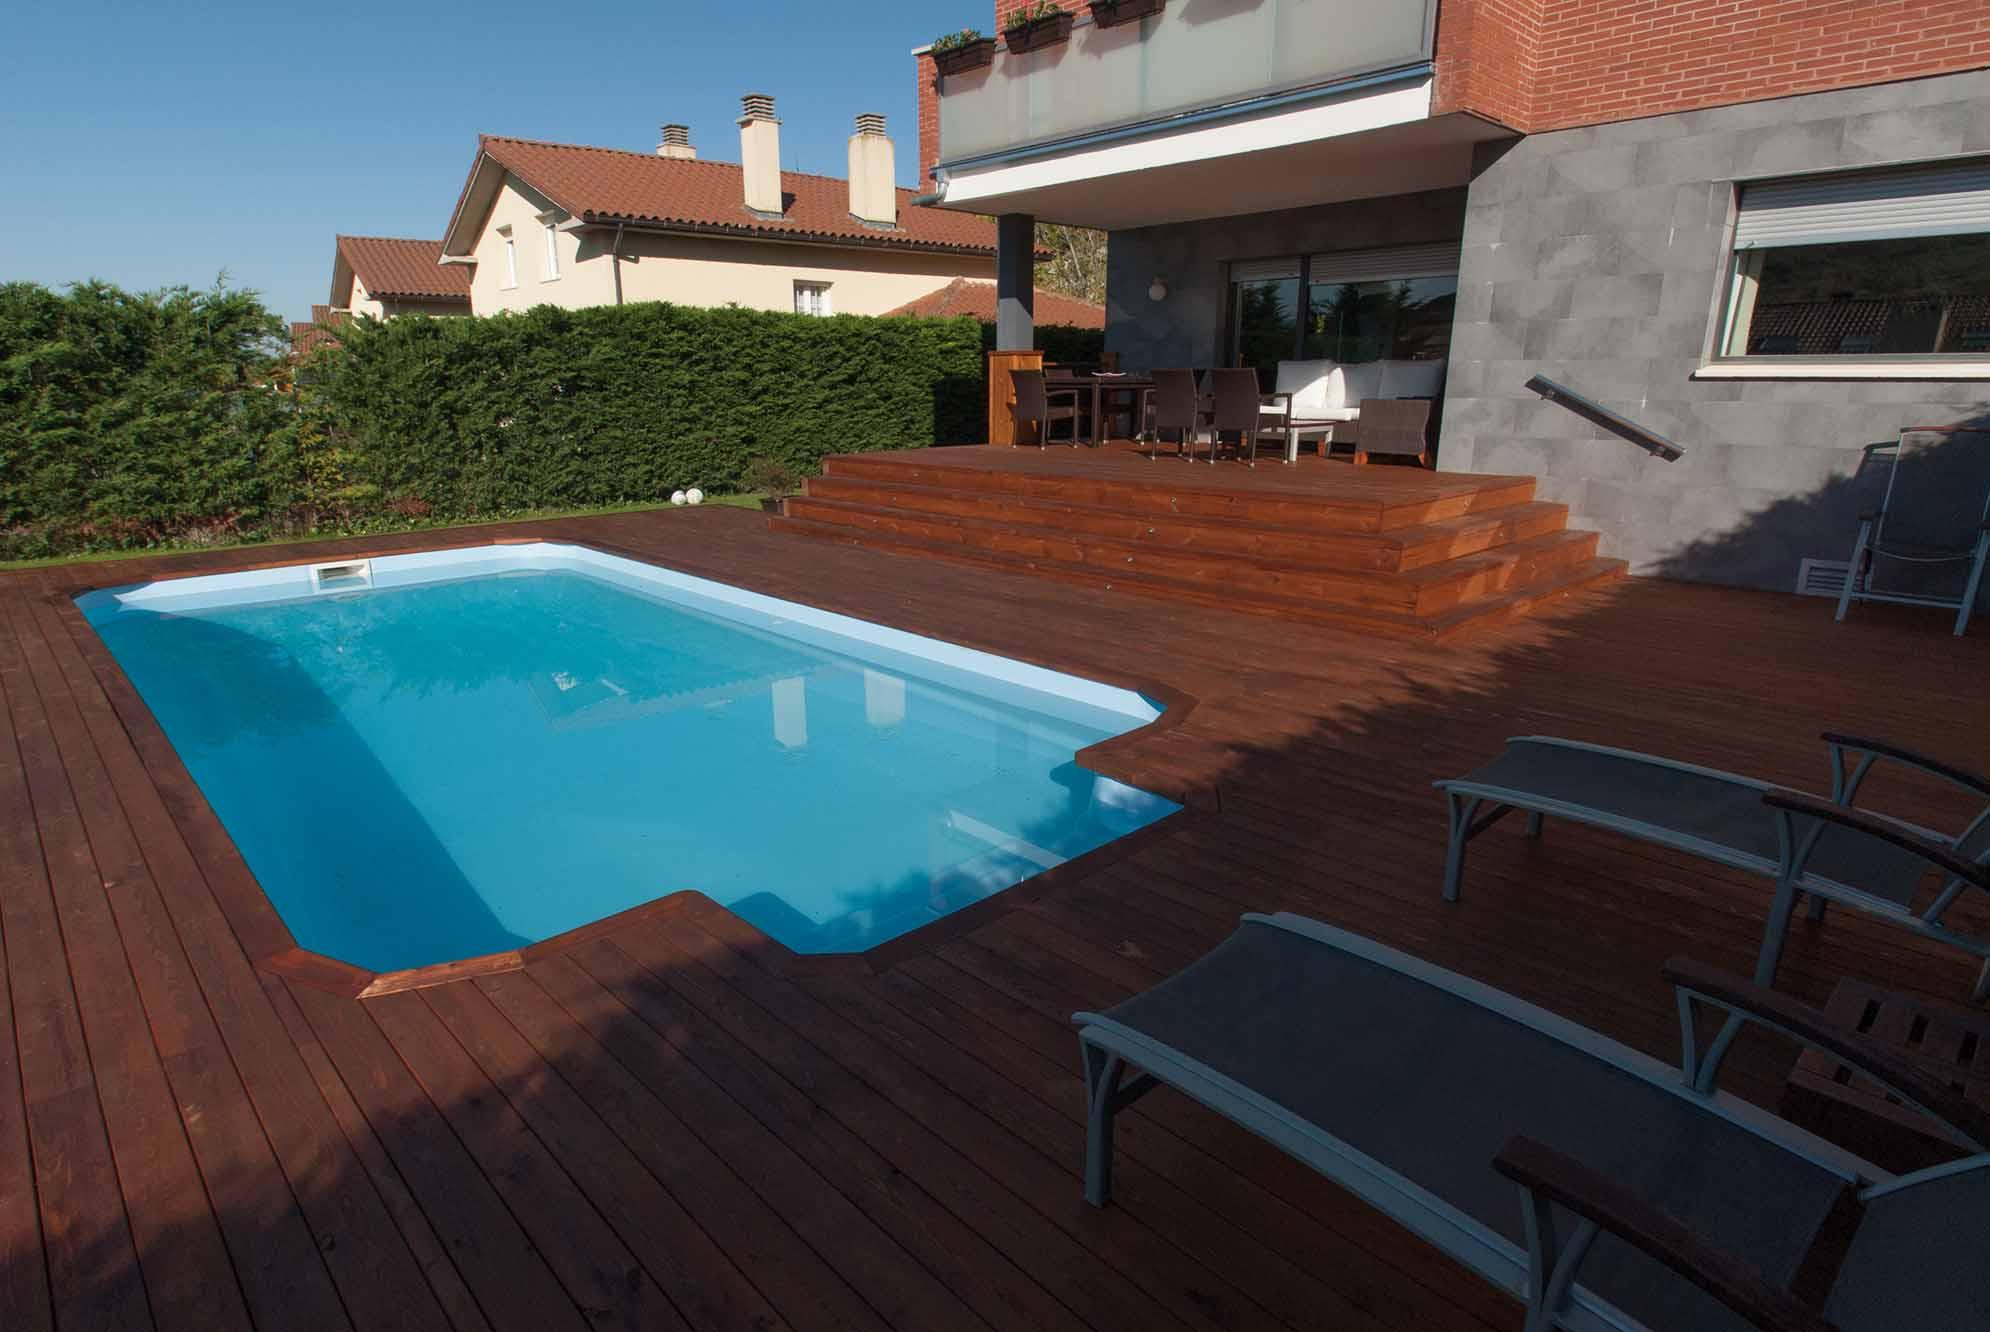 tarima-piscina-jardin-pino-nordico-2